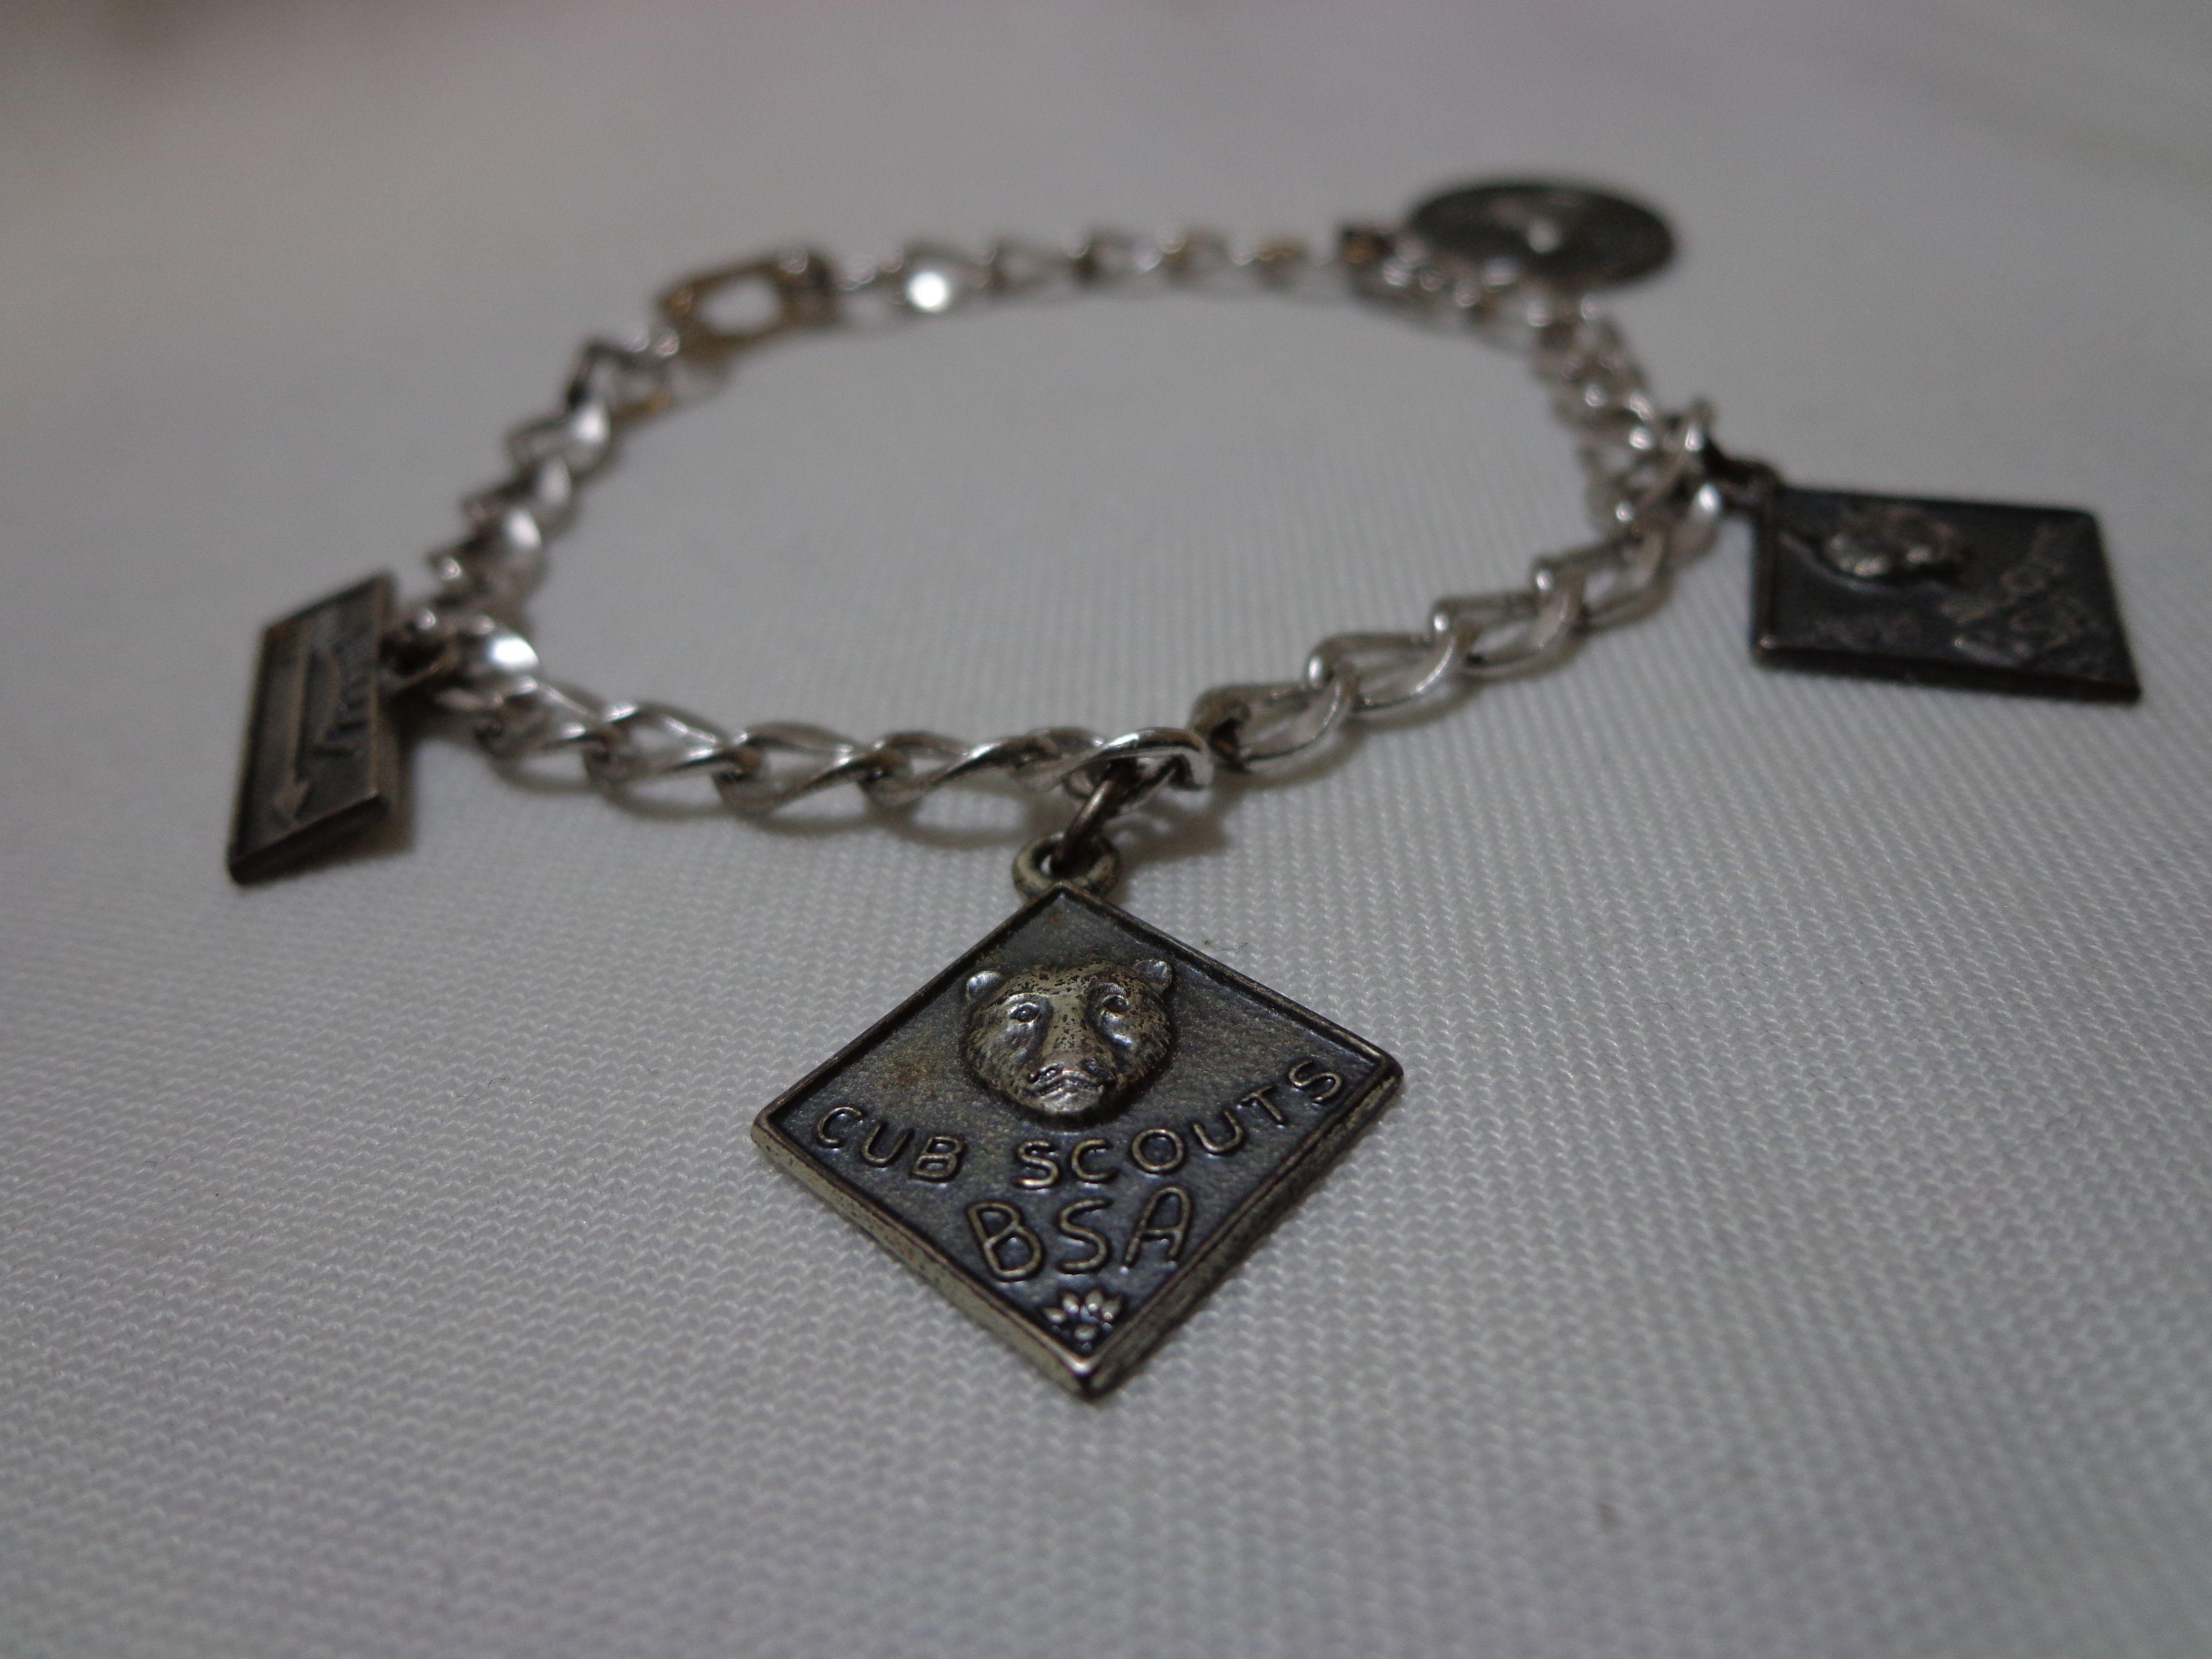 Vintage 1950s 925 Sterling Silver Boy Scout Charm Bracelet W 4 Charms